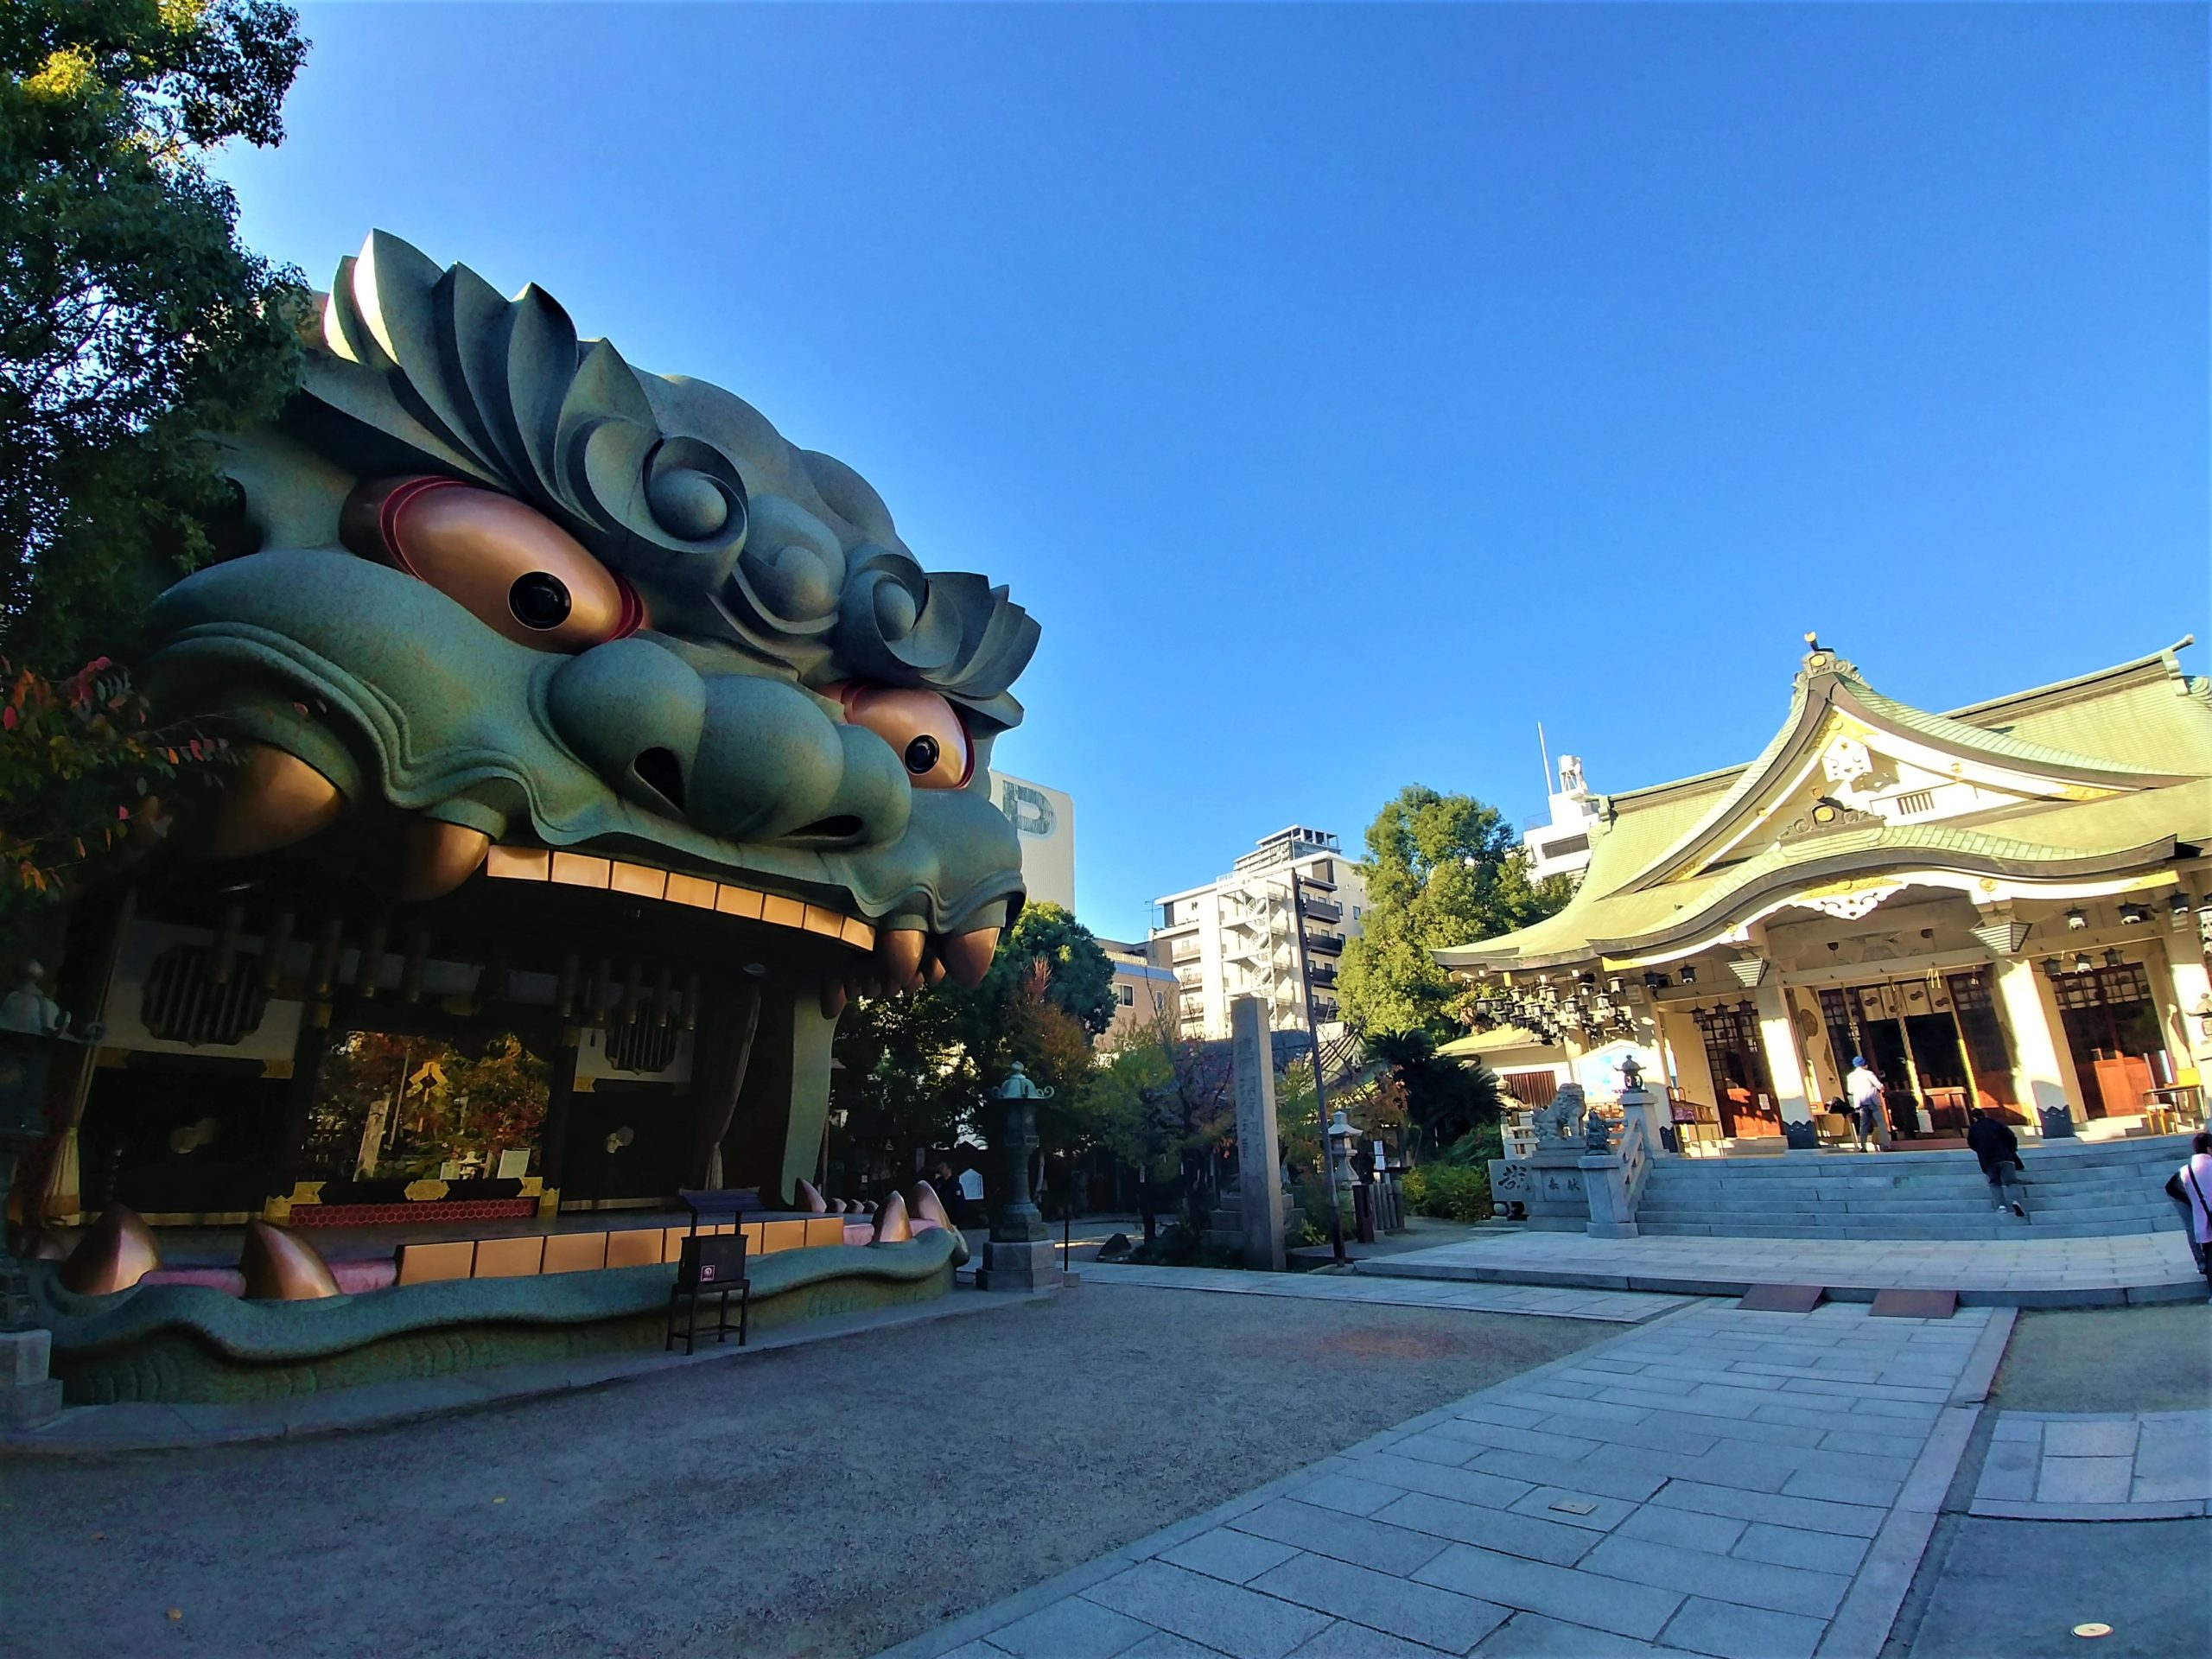 osaka temple tigre visiter infos pratiques japon arpenter le chemin